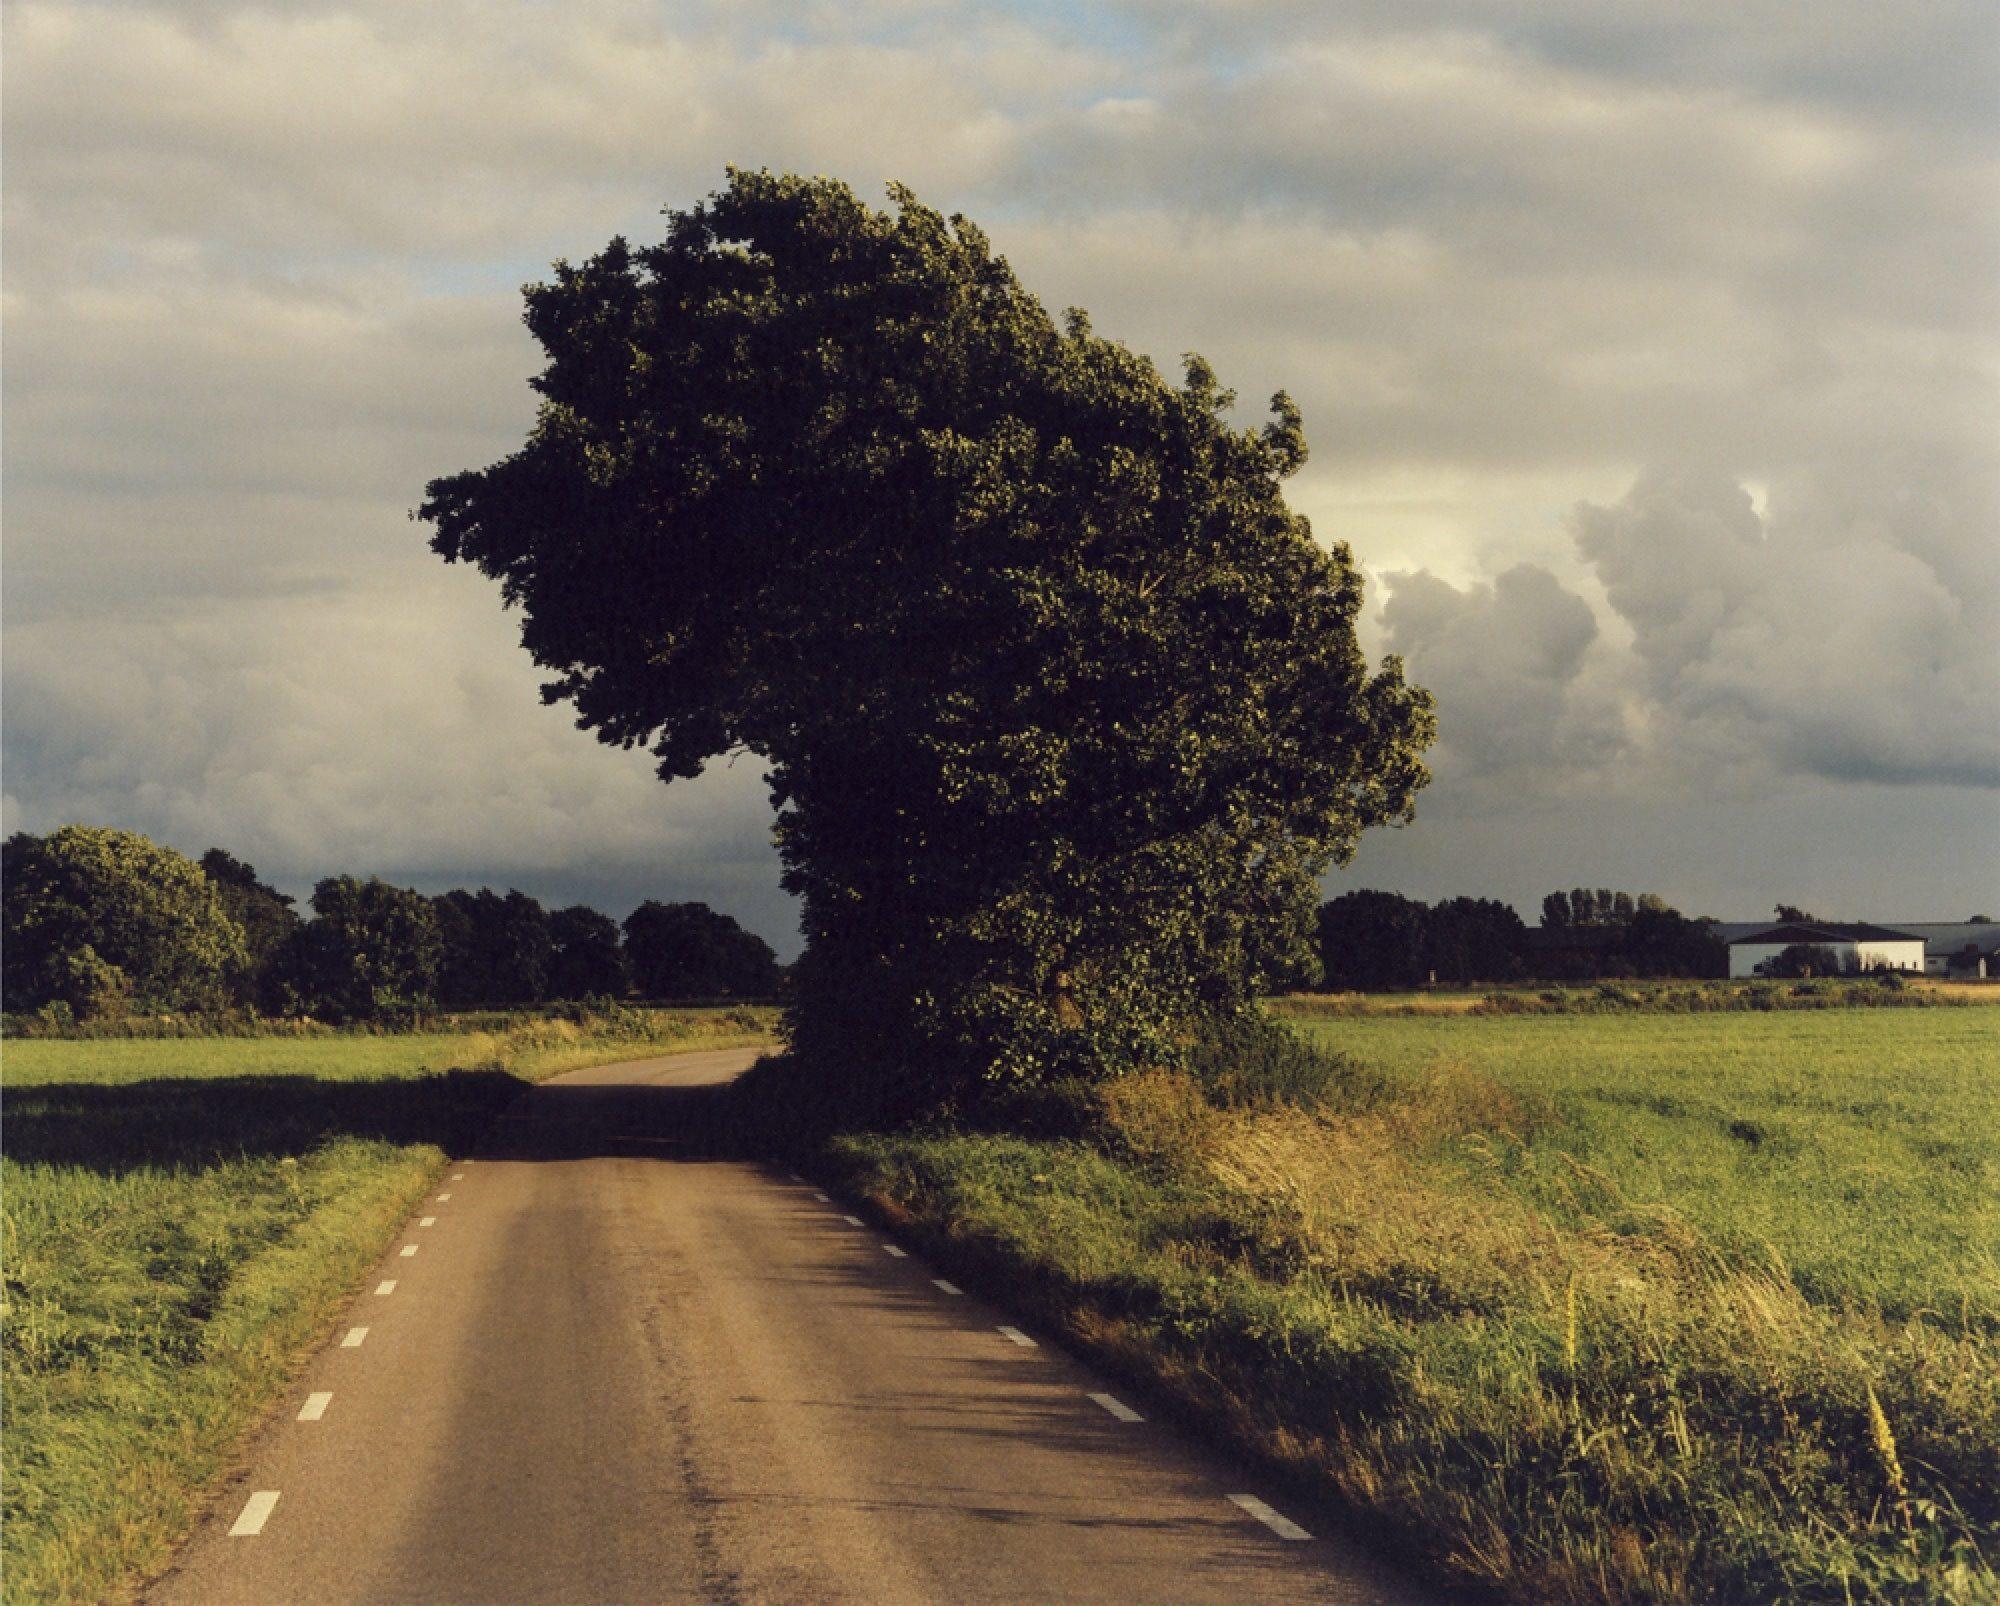 jamie-hawkesworth-a-short-pleasurable-journey-work16_2000w.jpg